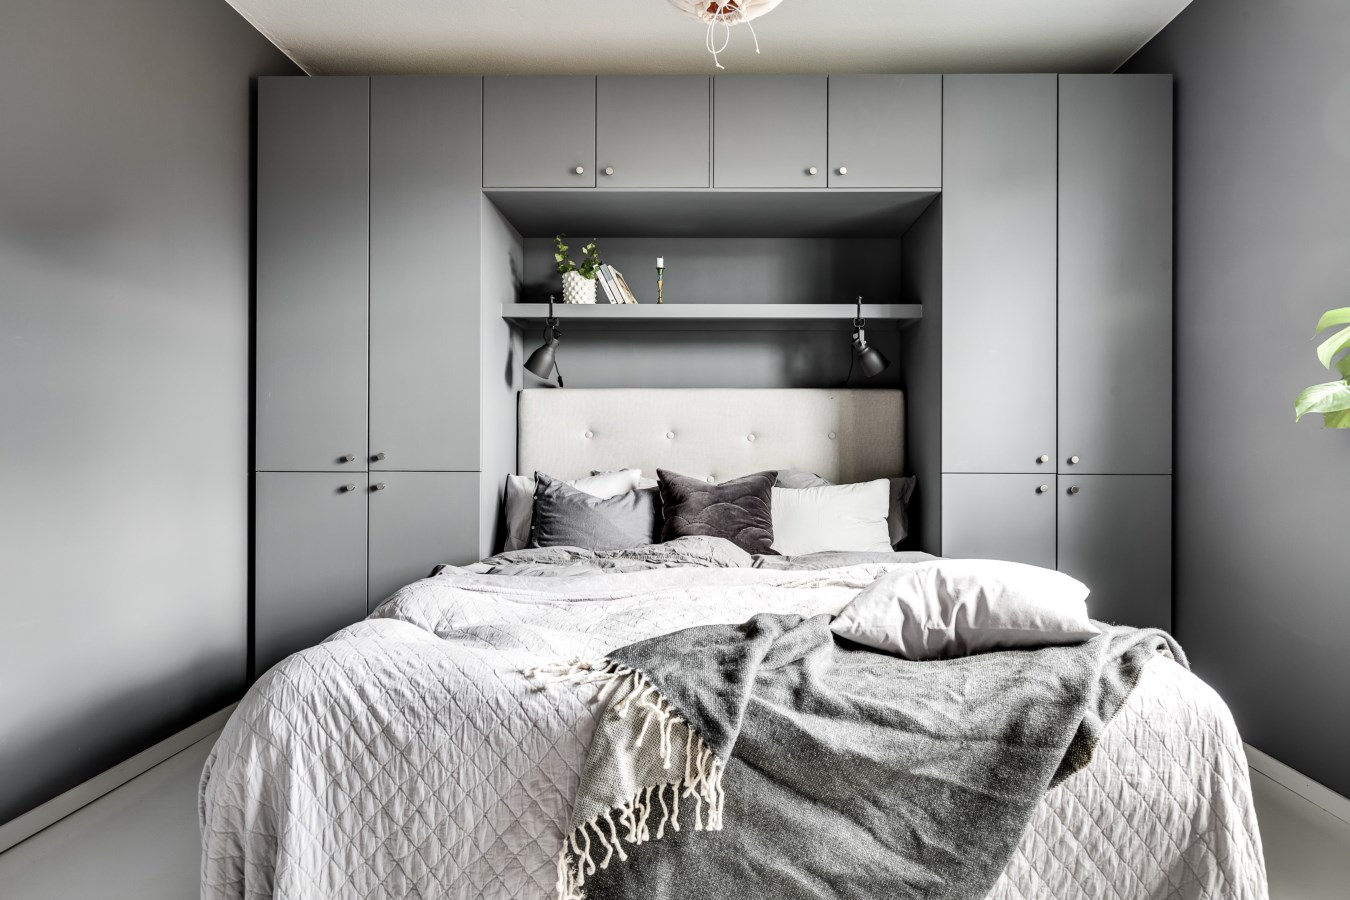 Witte Slaapkamer | Slaapkamer ideeën